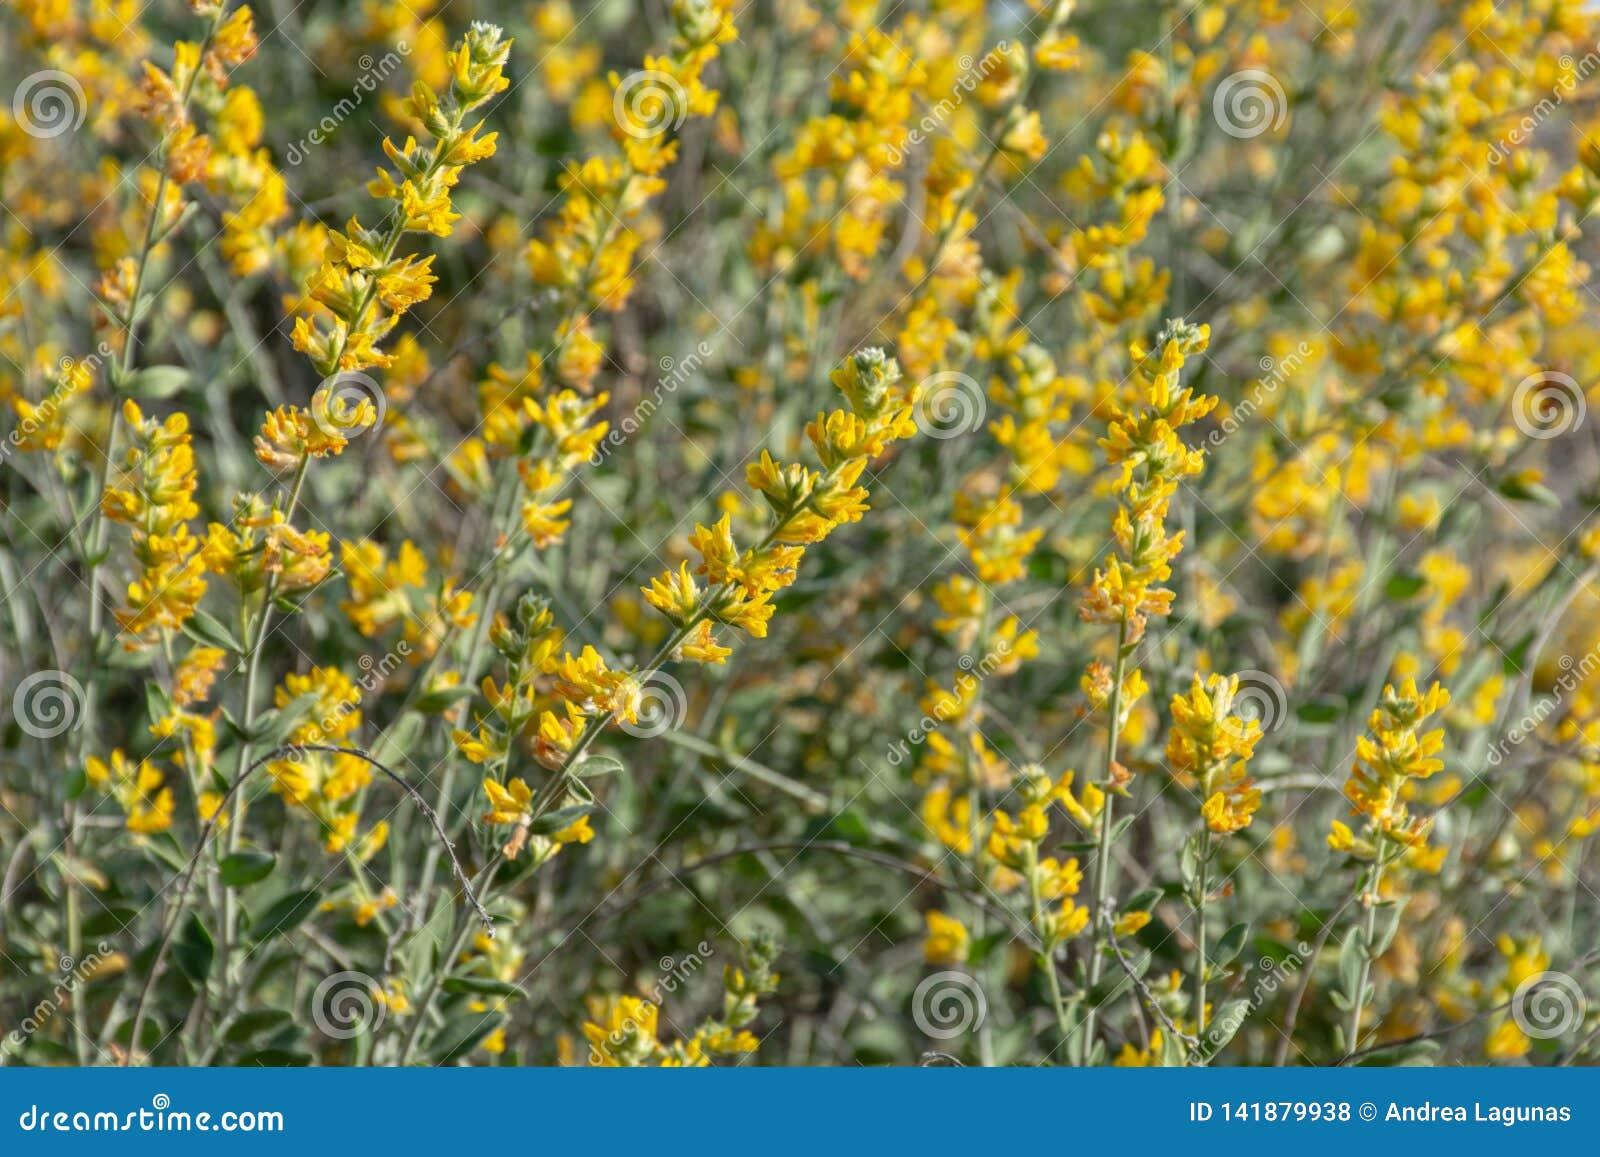 Groep gele bloemen